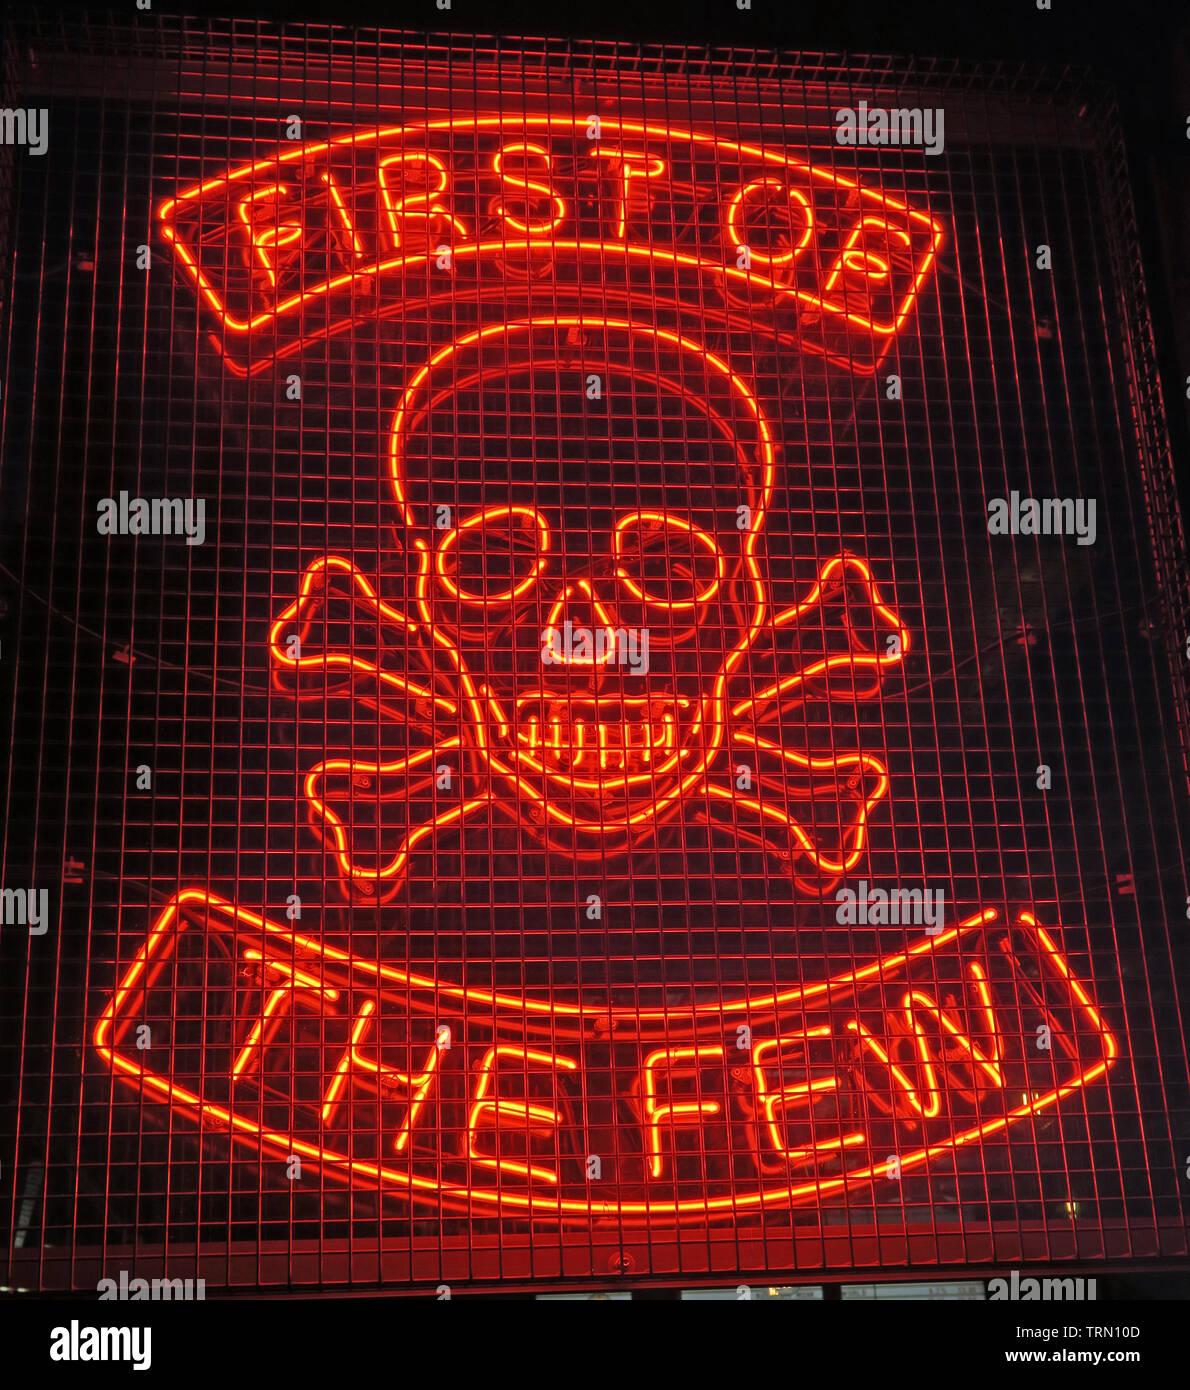 GoTonySmith,@HotpixUK,HotpixUK,North East,North East Scotland,Scottish,UK,City Centre,The Granite City,Northeast,neon,sign,orange,BrewDog,Brew Dog,Brewdog Aberdeen,brewing,brewery,Skull,Crossbones,bars,The Few,head,face,red neon,night,lit,lights,2010,Brewdog first bar,1st,AberdeenBar,AB25,Gallowgate,draft,small batch,small-batch,horror